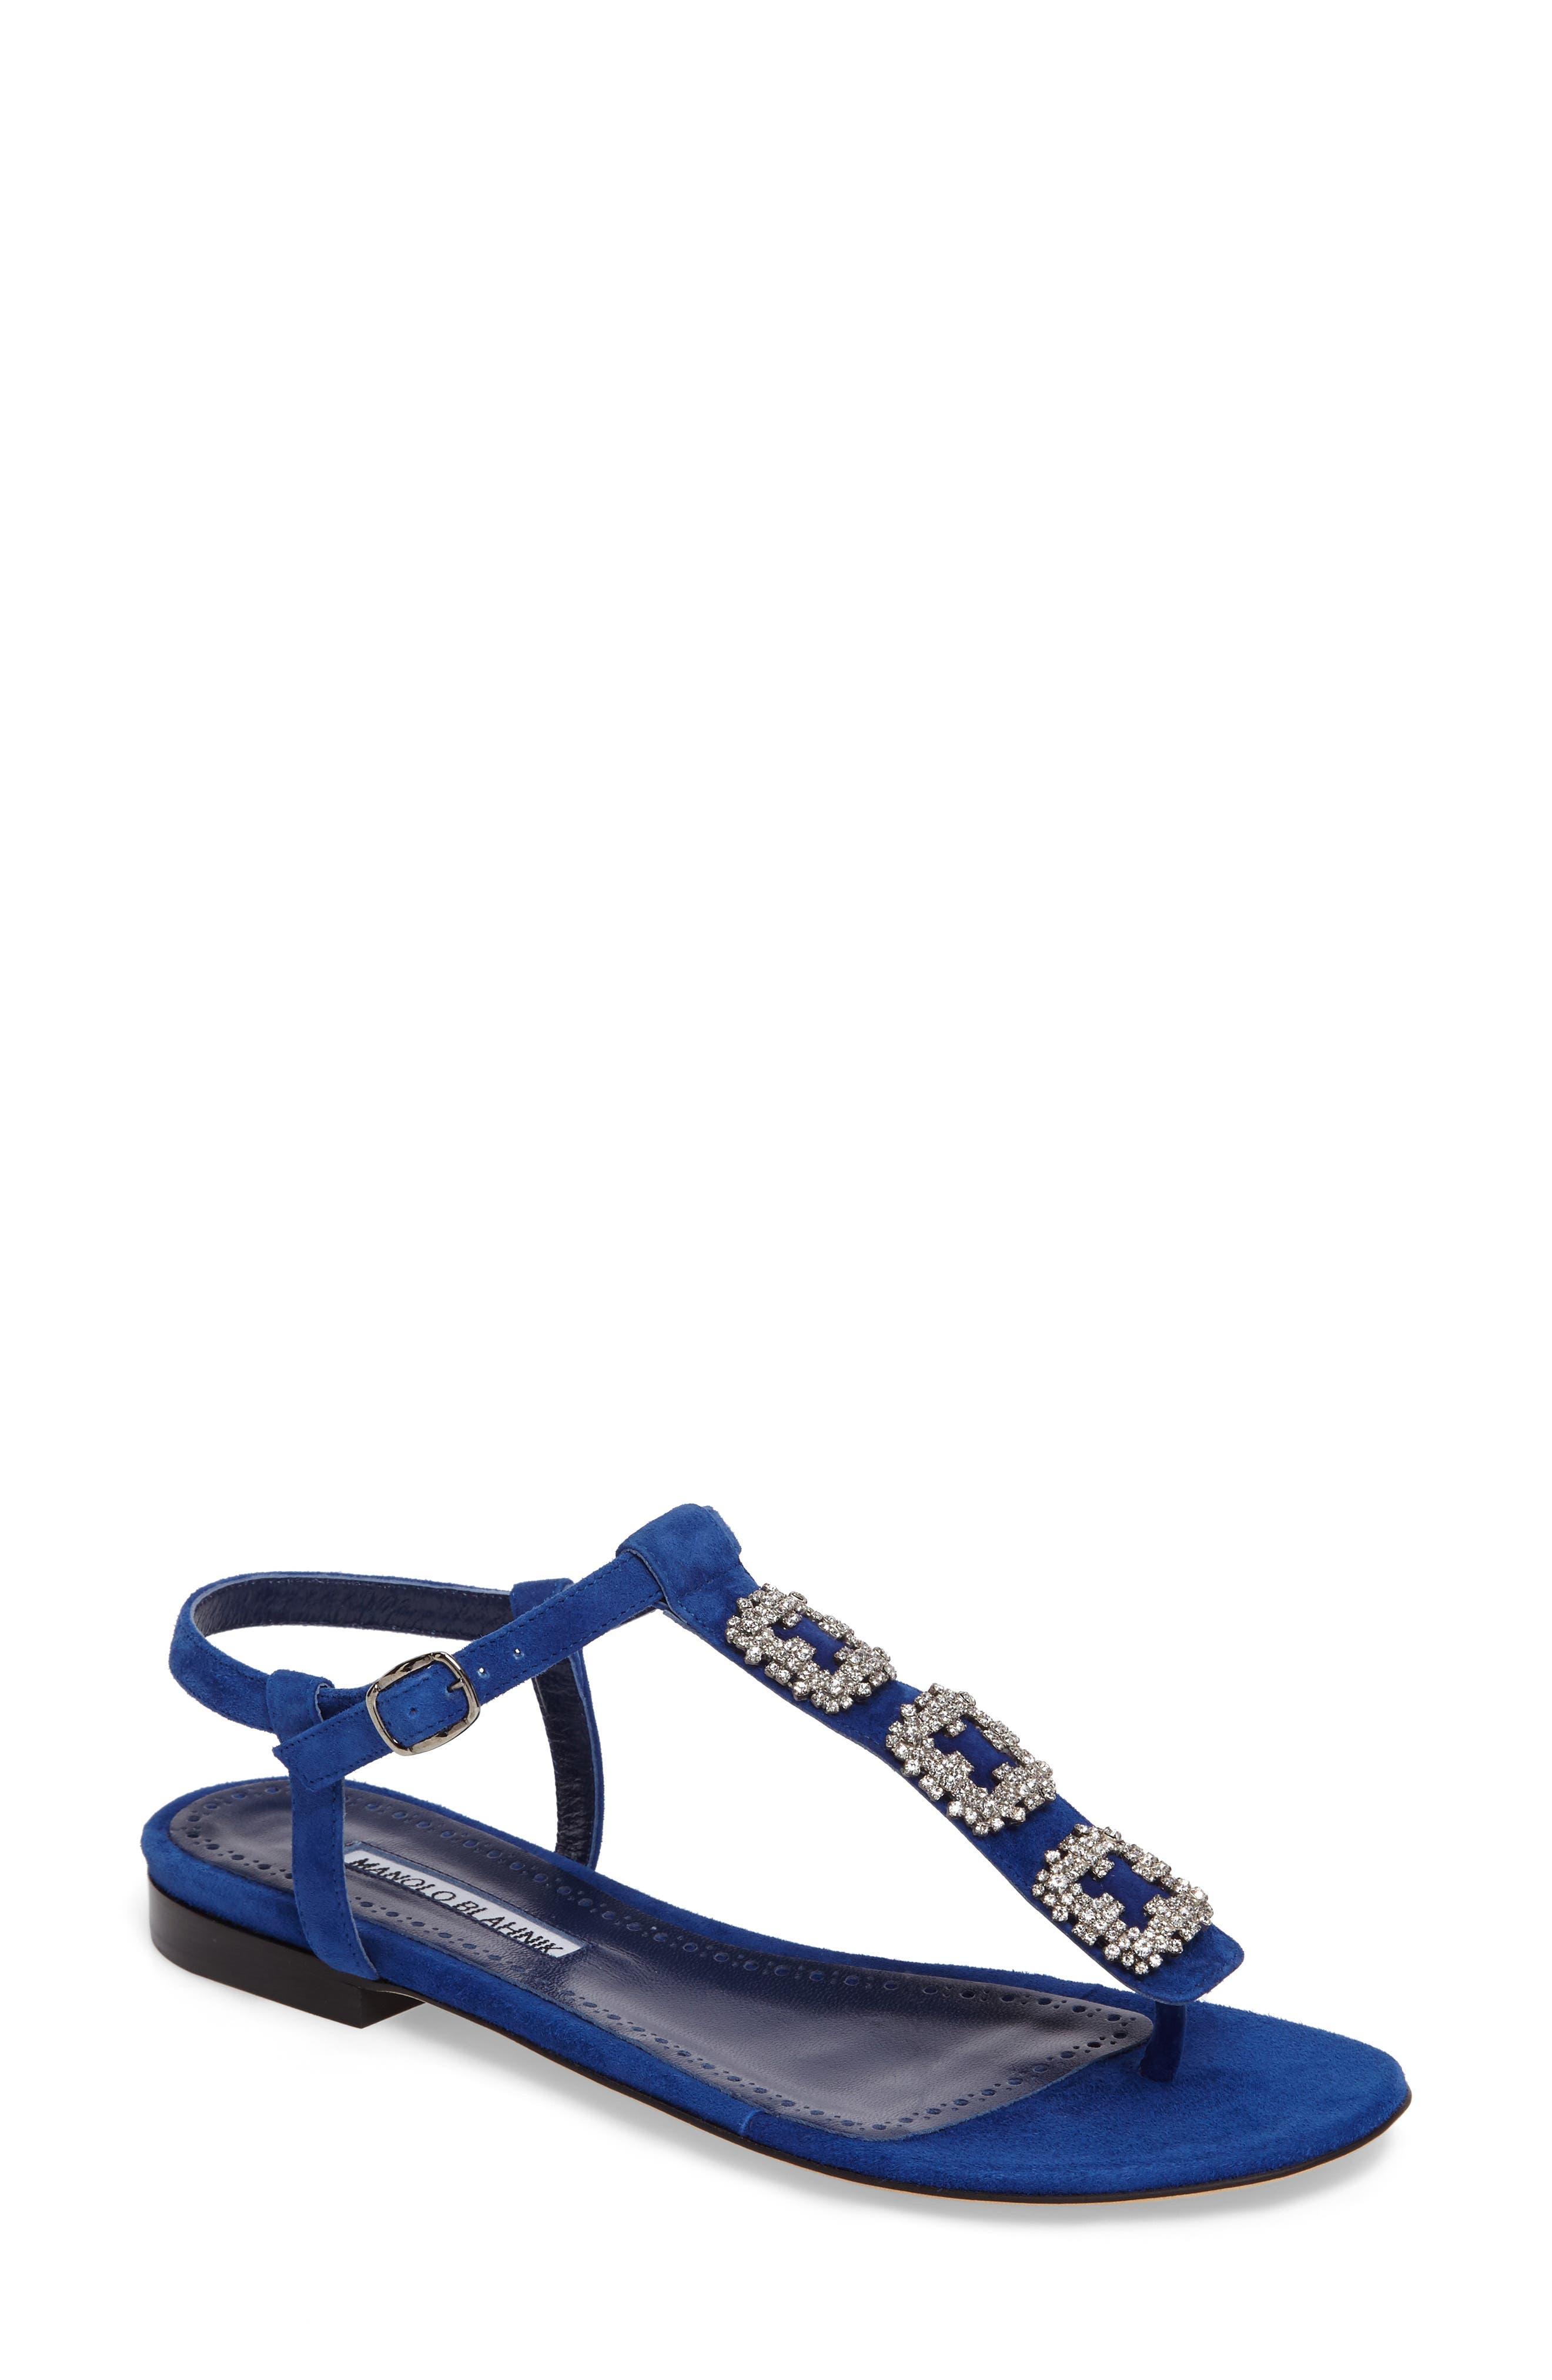 Ottolina T-Strap Sandal,                             Main thumbnail 1, color,                             Blue Suede